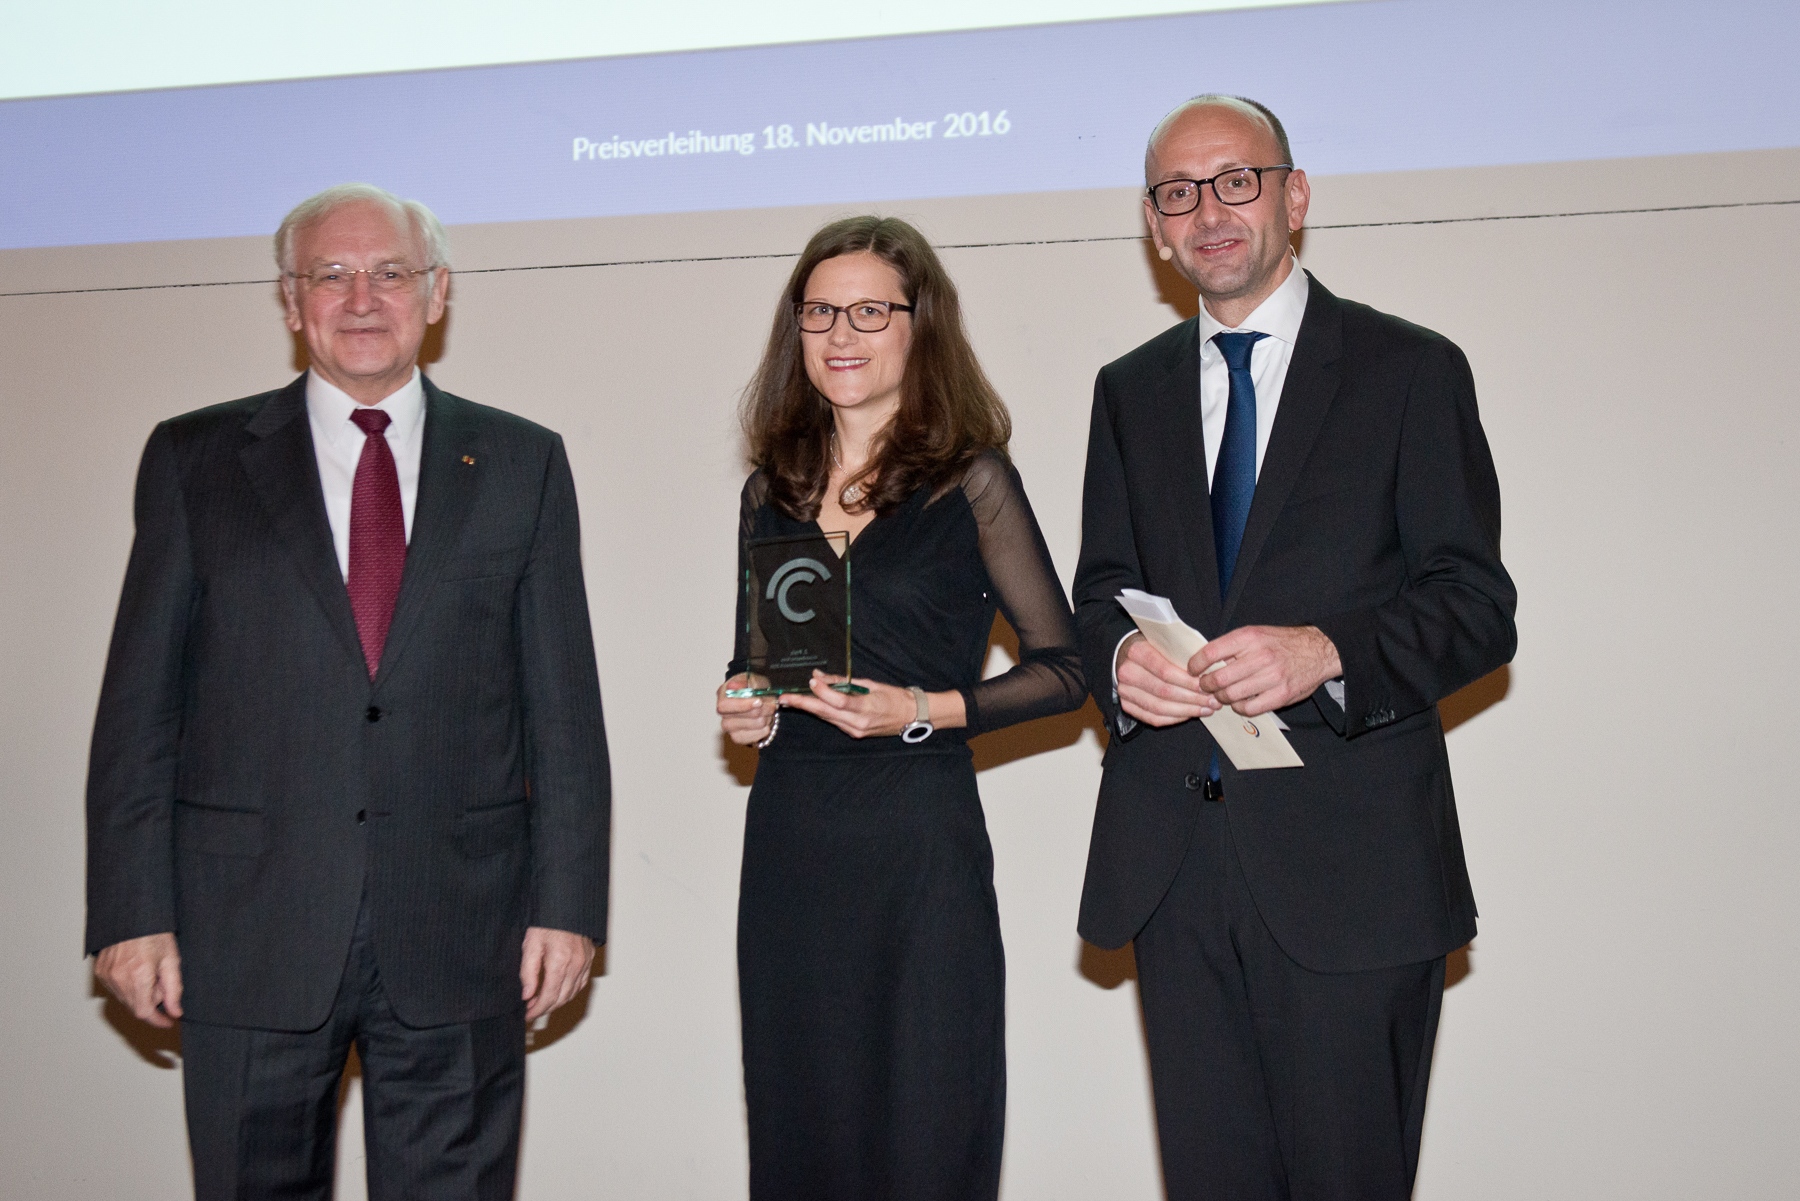 Prof. Dr. Siegfried Beck, Dr. Andrea Braun (2. Preis), Prof. Dr. Lucas F. Flöther